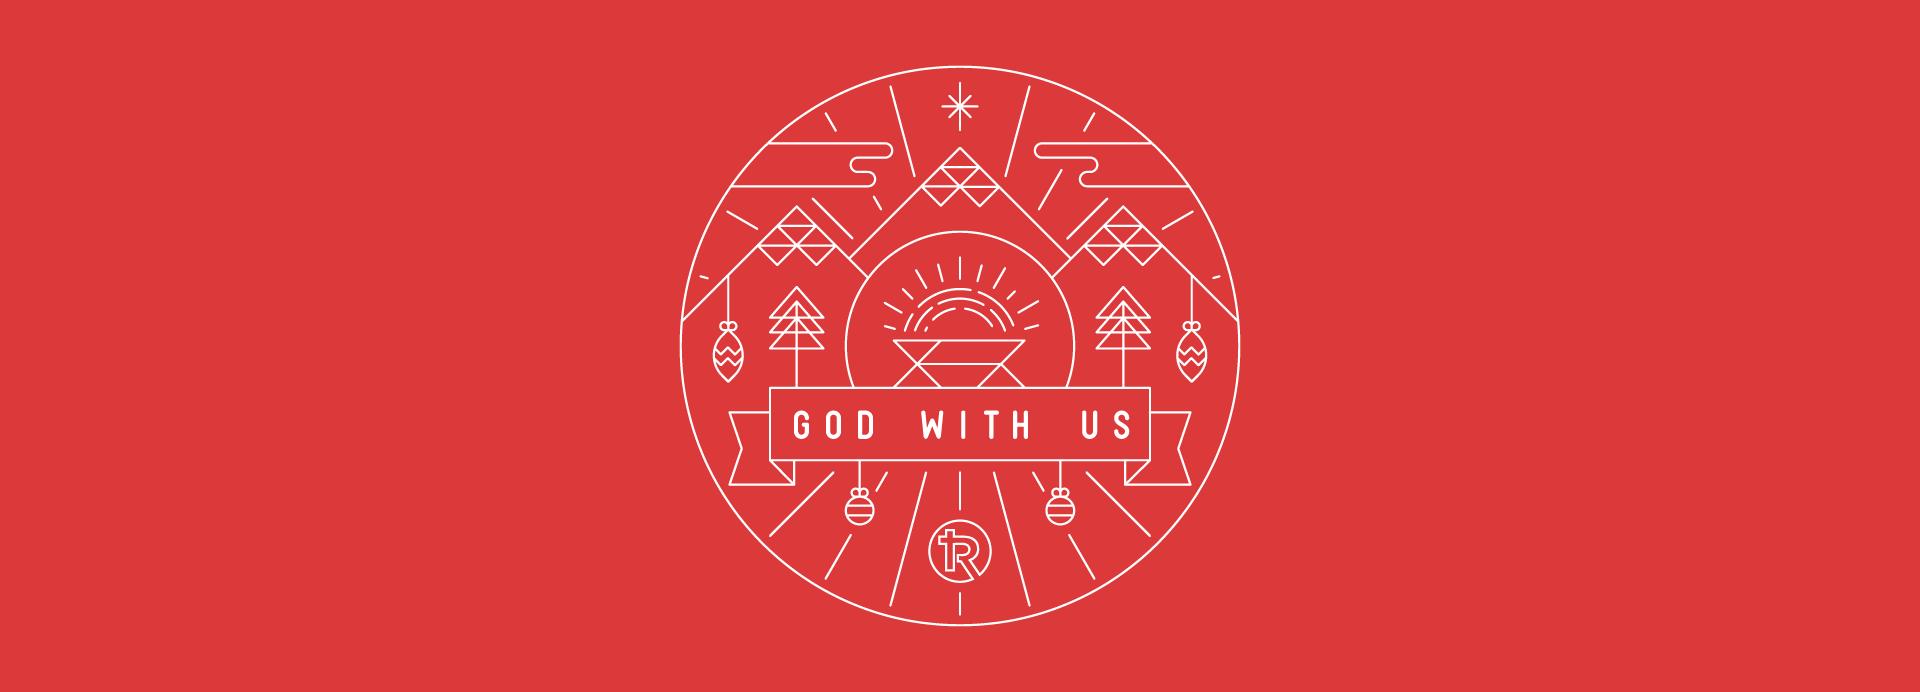 God With Us Christmas Series at The Rock Church in Draper Utah